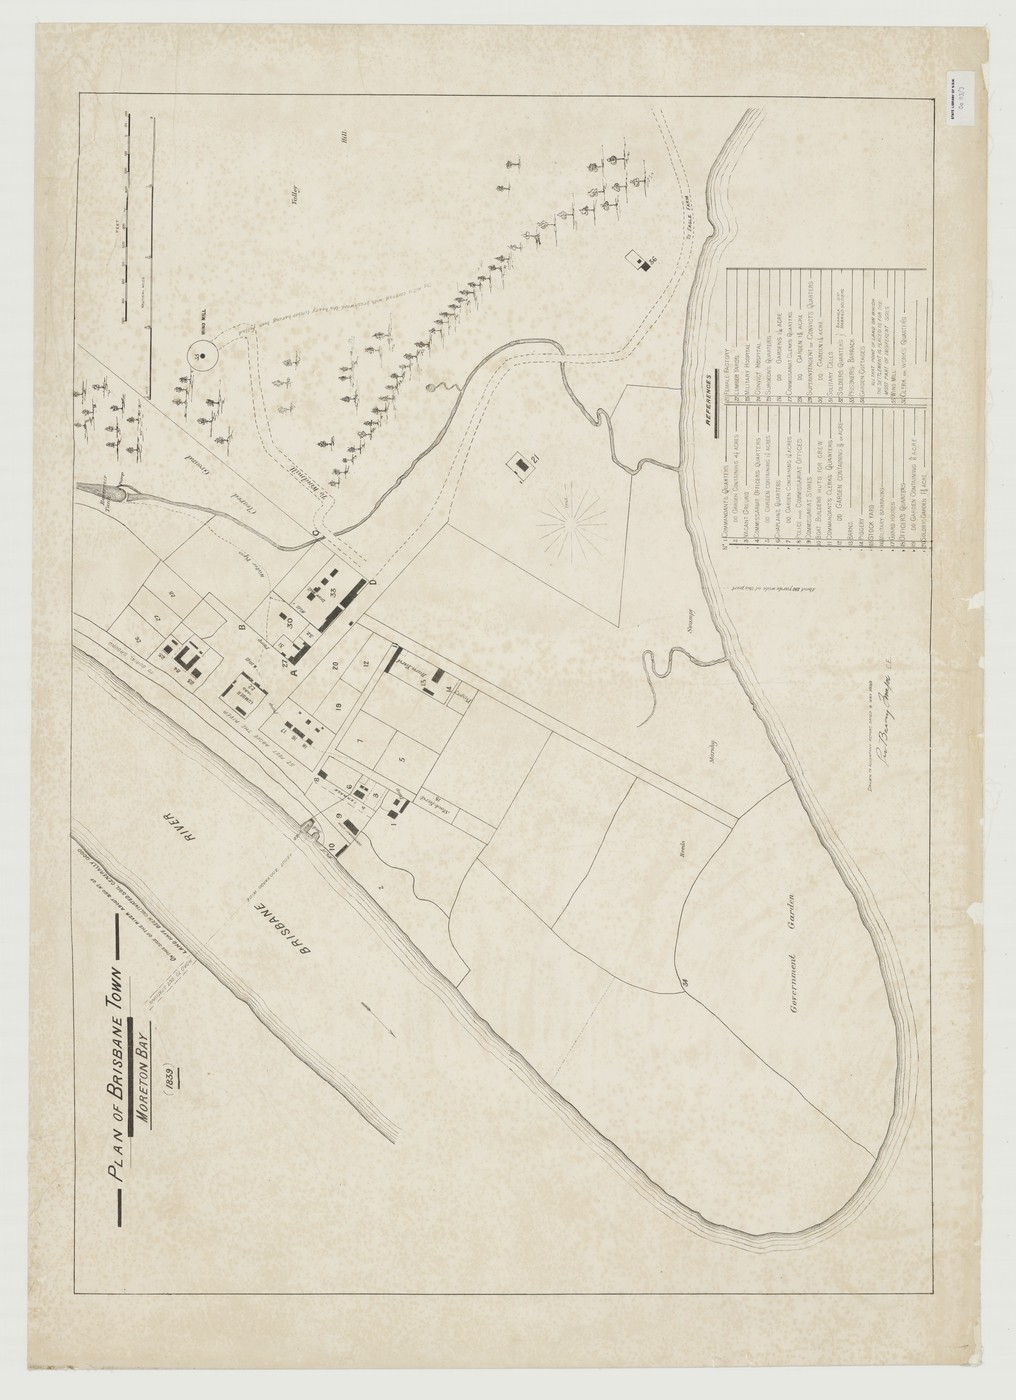 Brisbane 1839